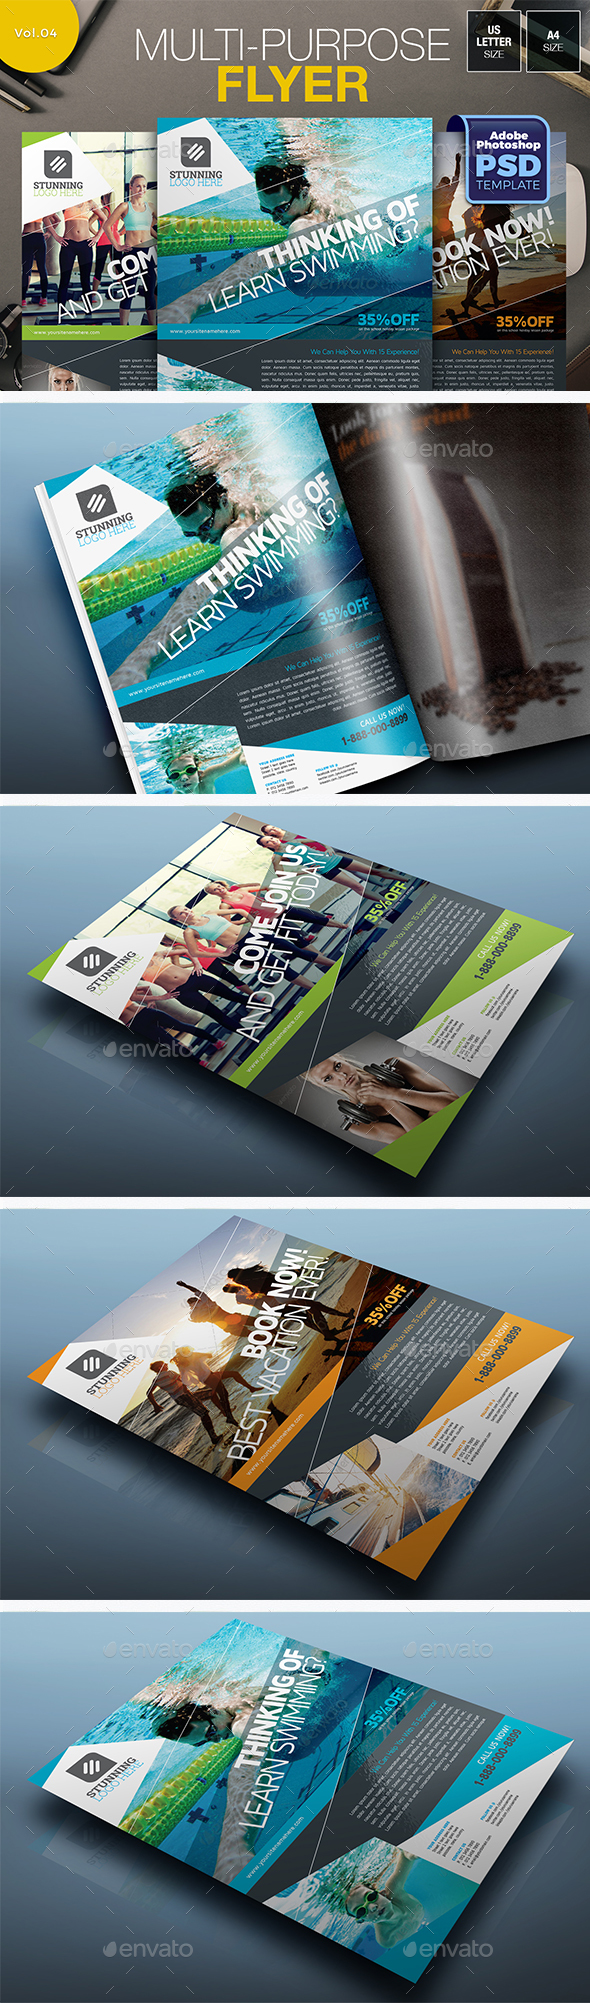 Multipurpose Flyer Vol.04 - Miscellaneous Events